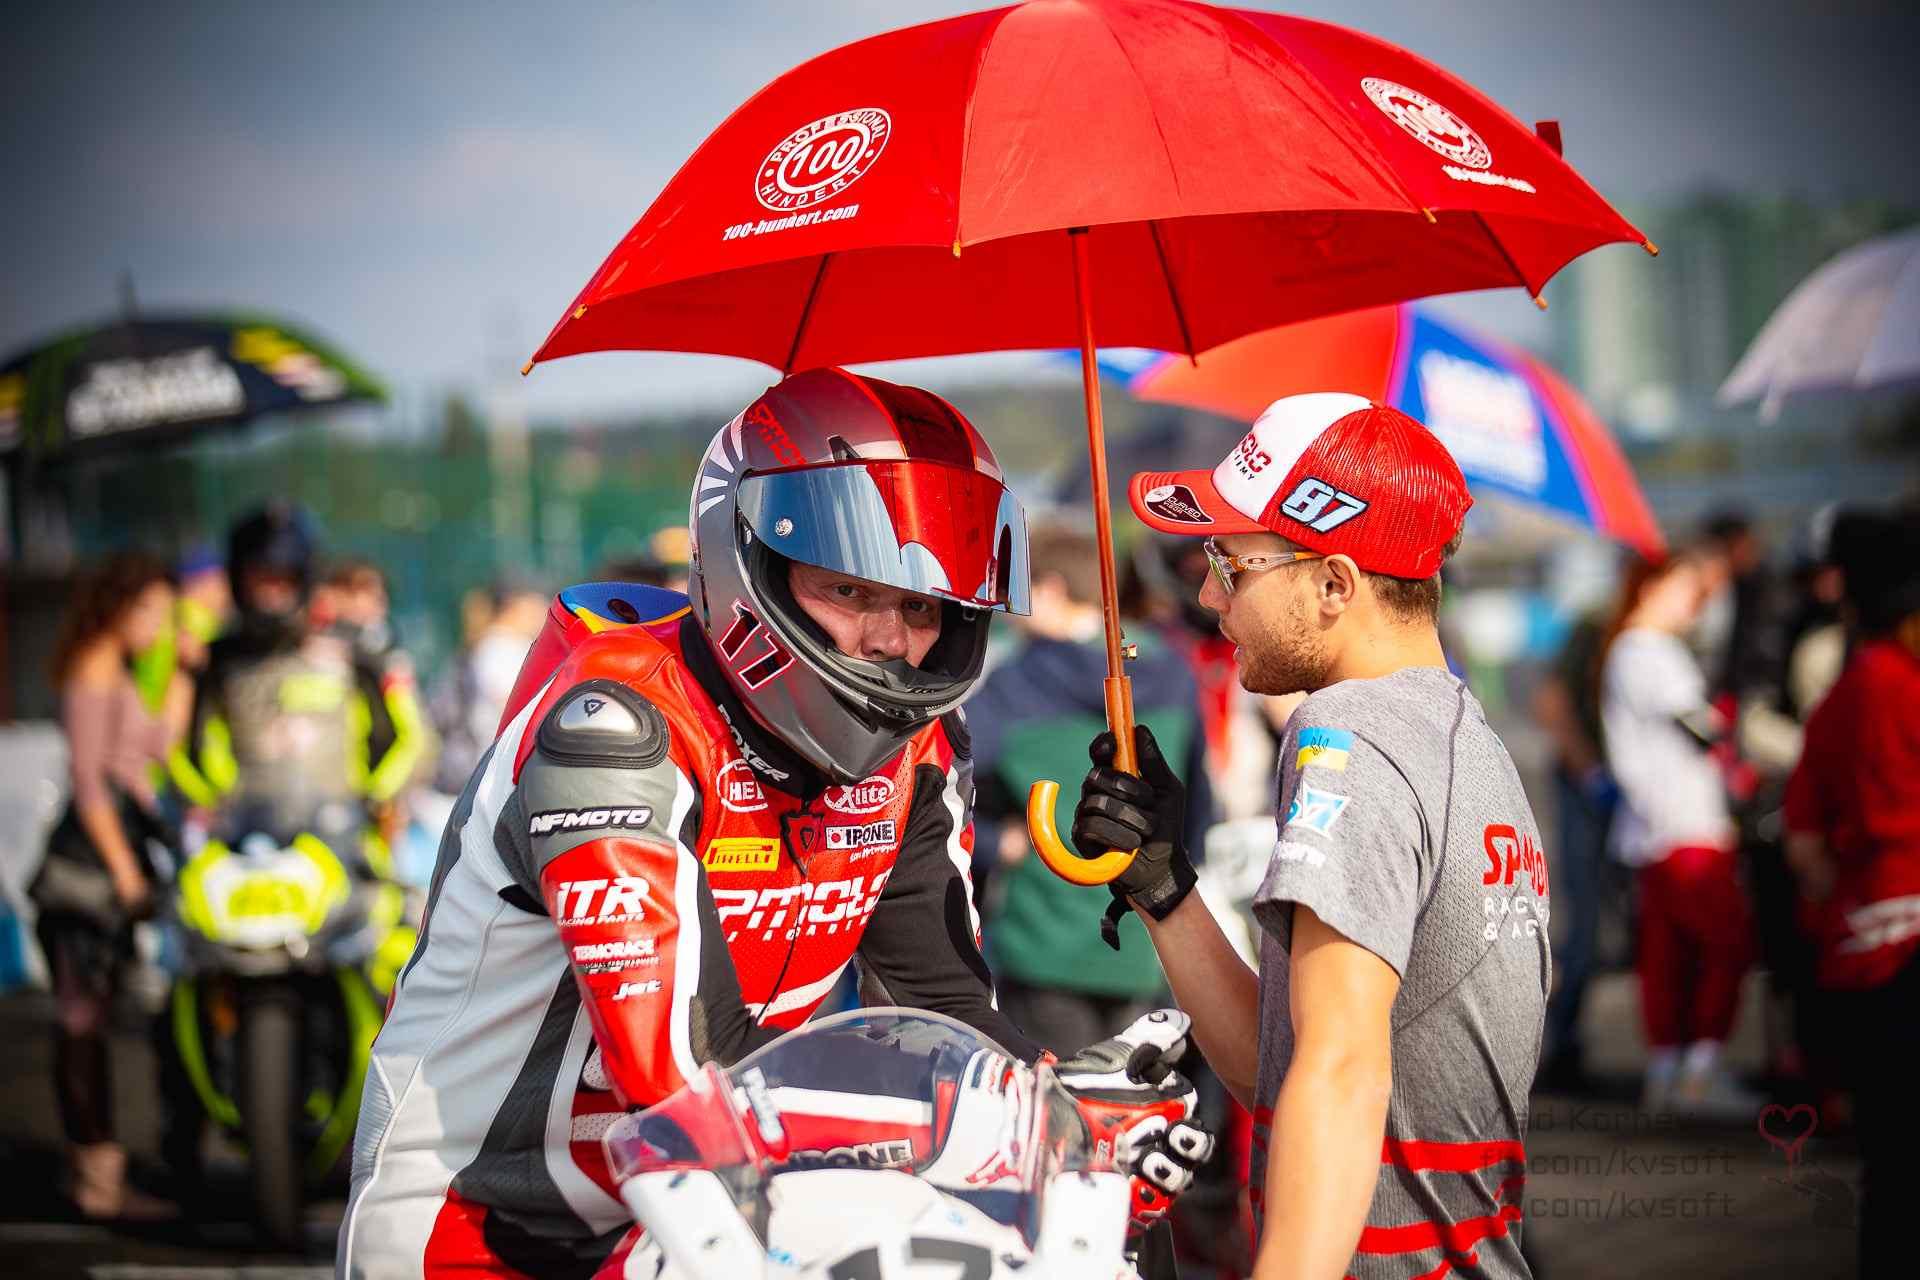 5-6_etap_MotoGPUkraine_007